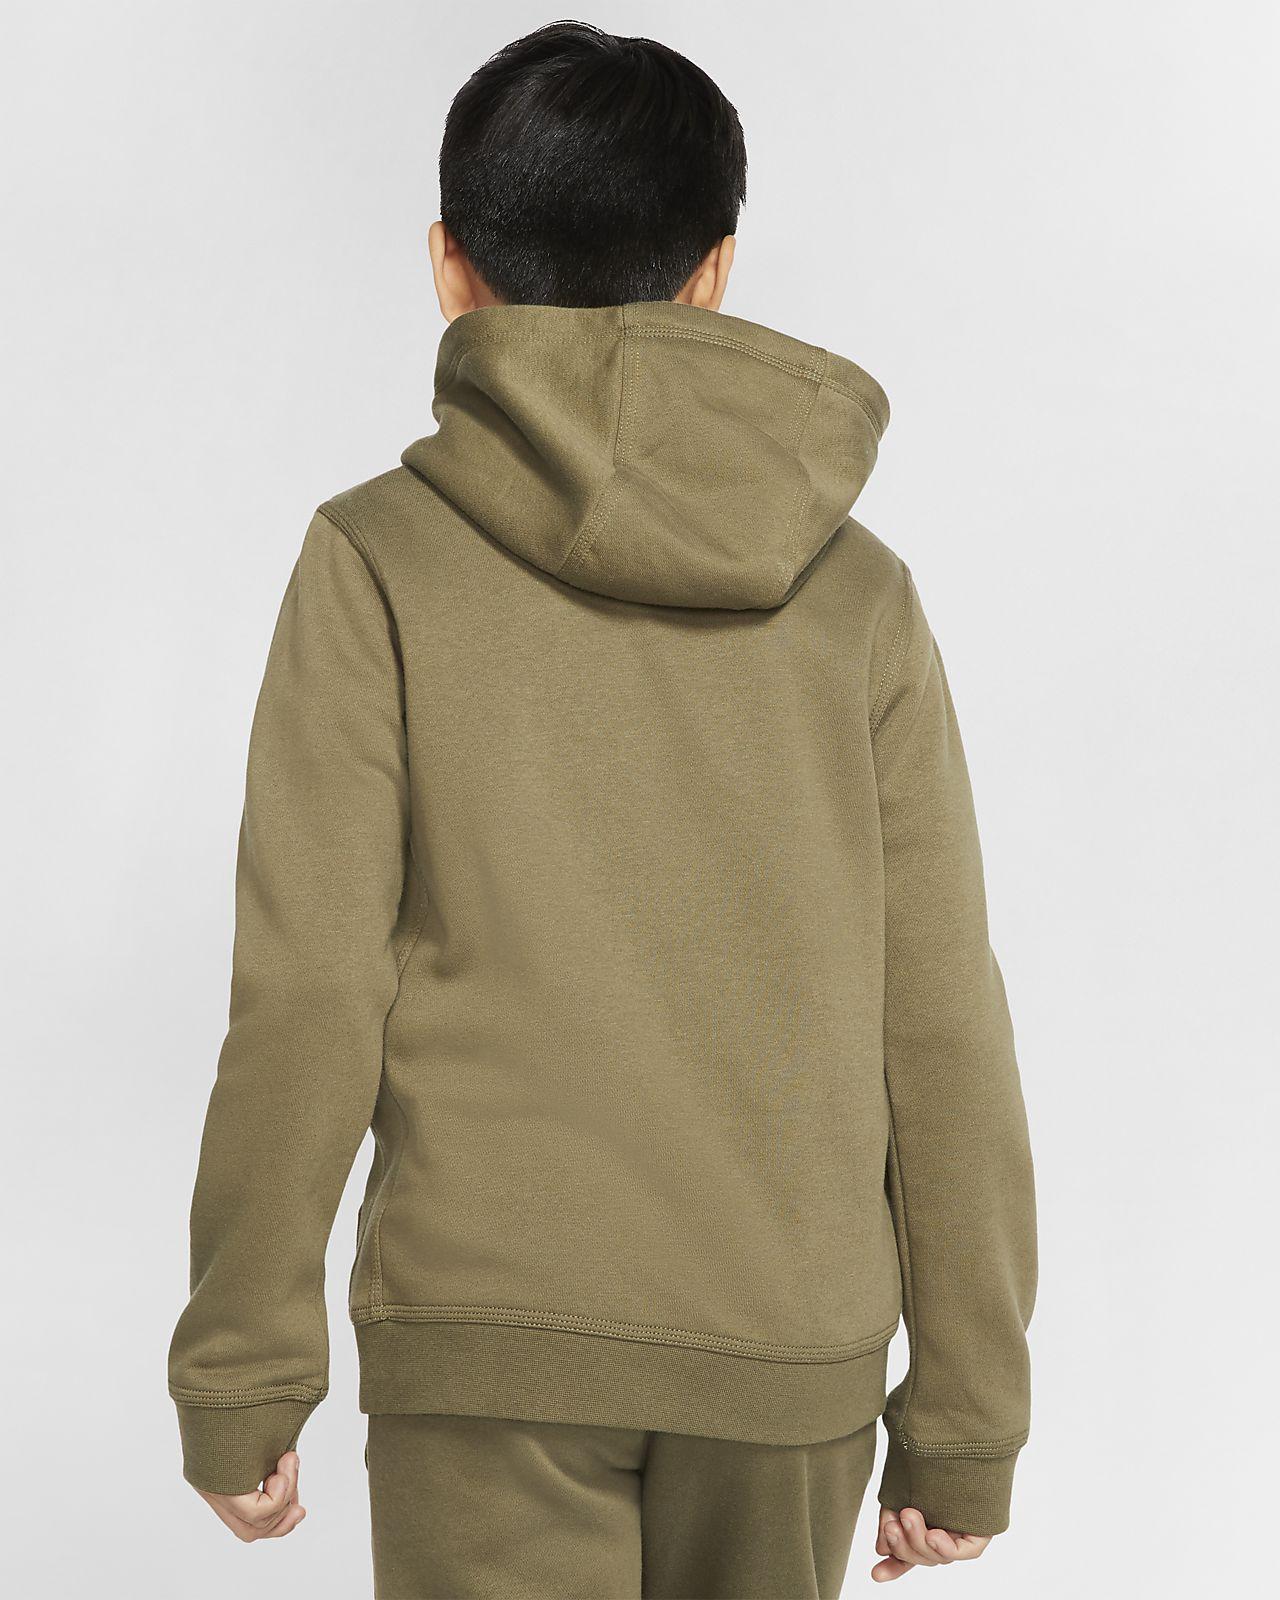 the latest bffb4 64572 Nike Sportswear Club Pullover für ältere Kinder